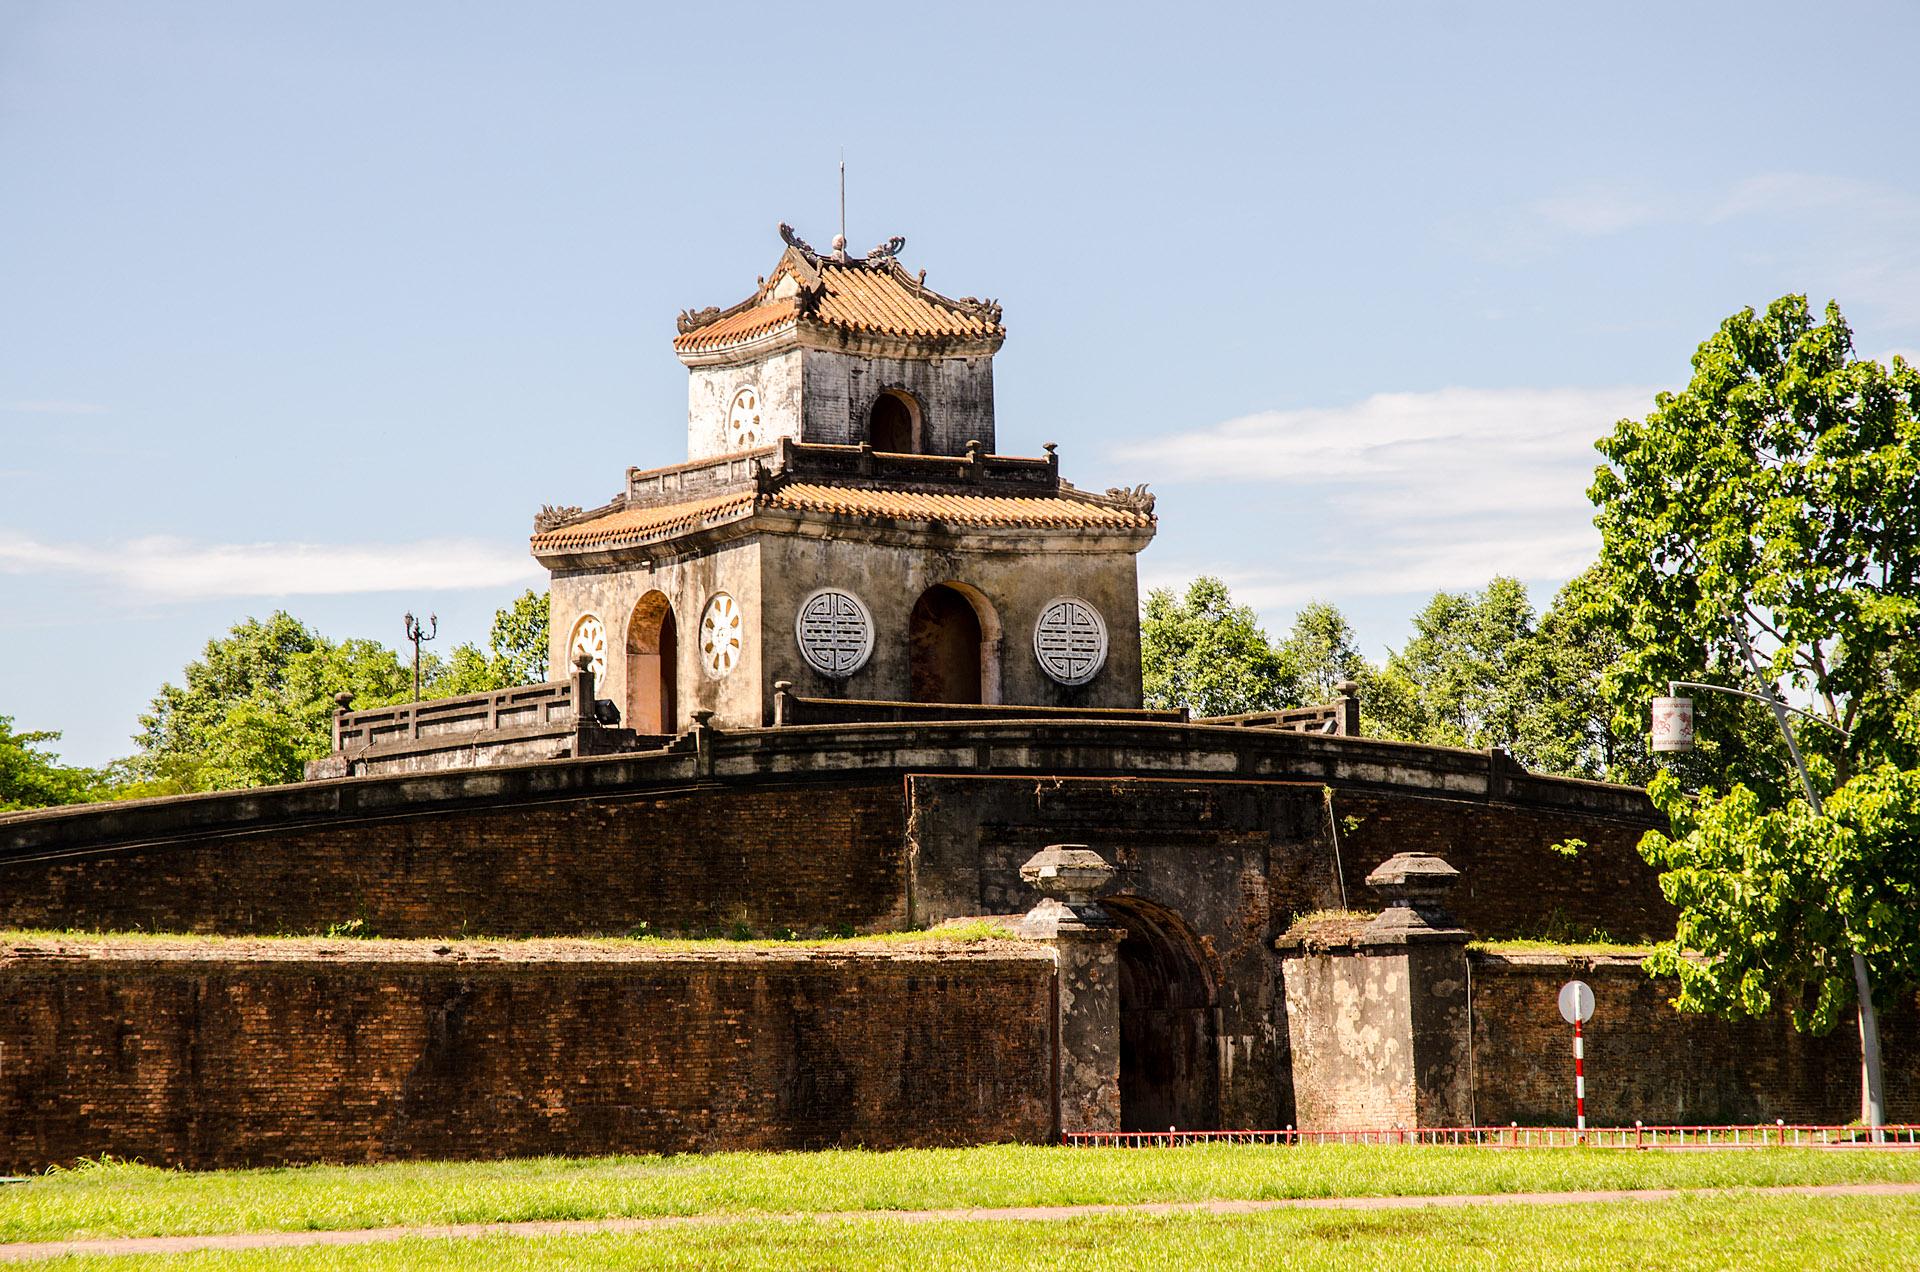 Quang Duc Gate